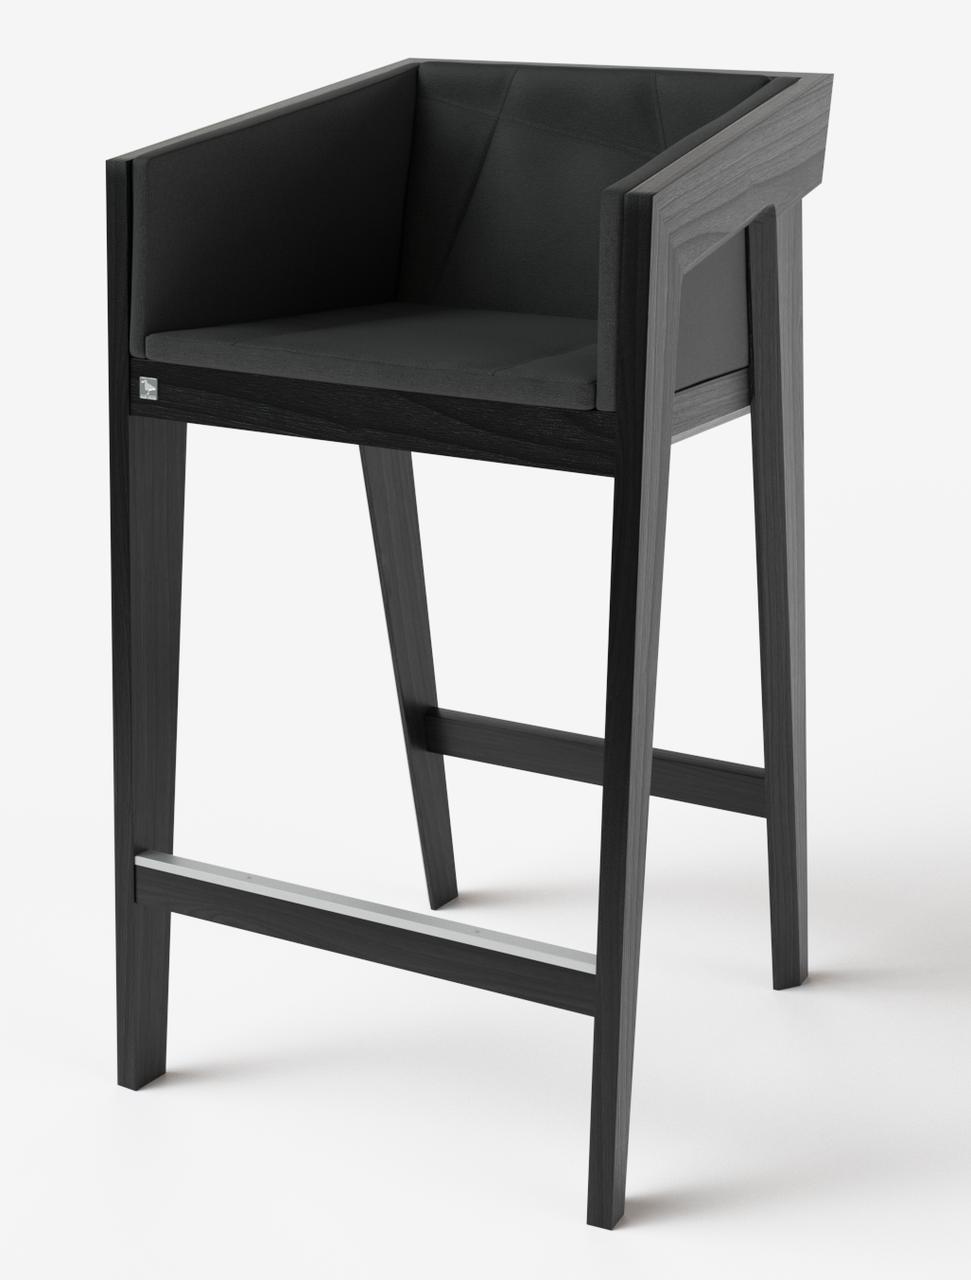 Барный стул Air 2 bar m 4 soft black ТМ Kint